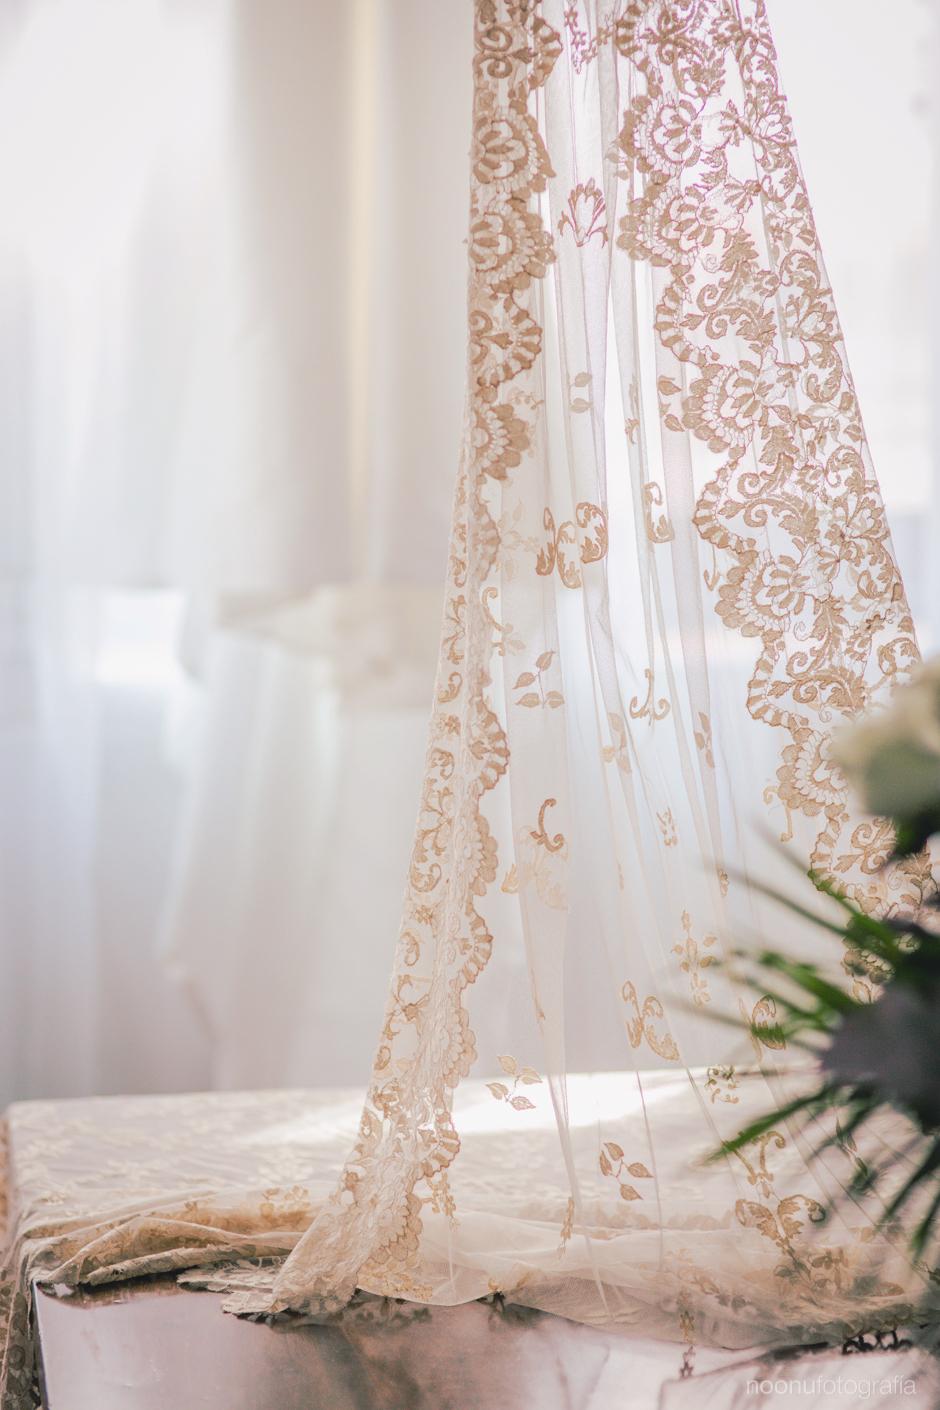 Noonu-fotografo-de-bodas-madrid-pilar 1-2